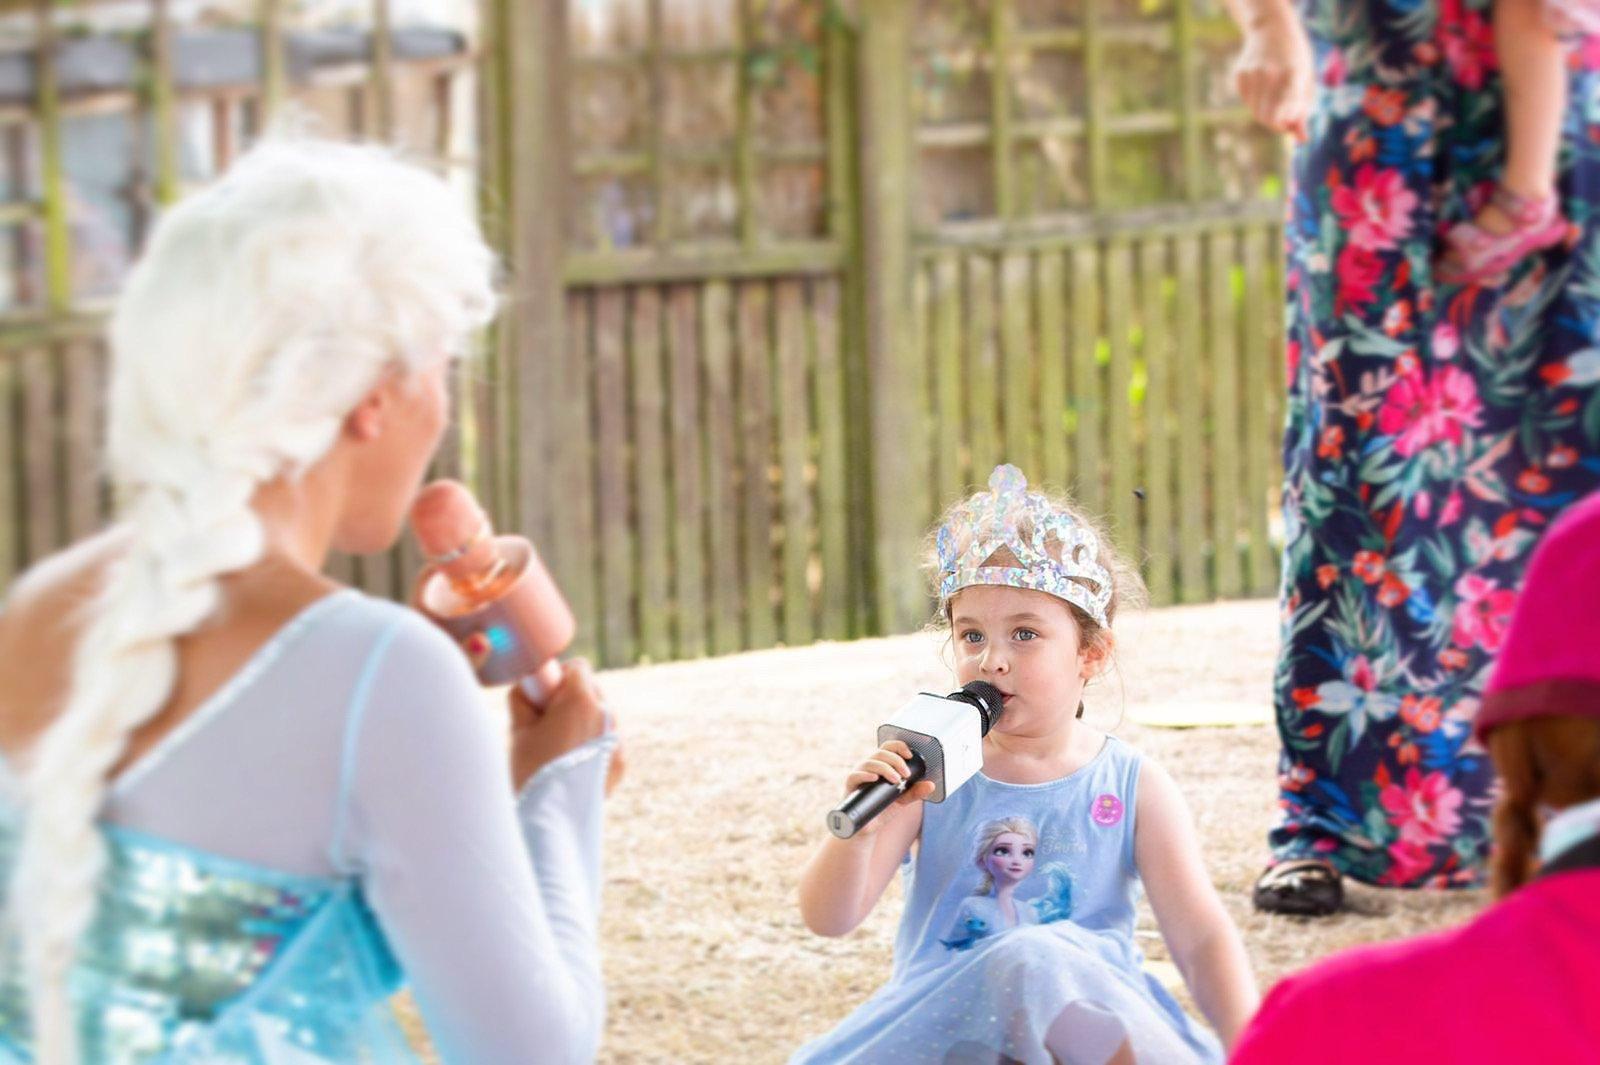 surrey singing princess party